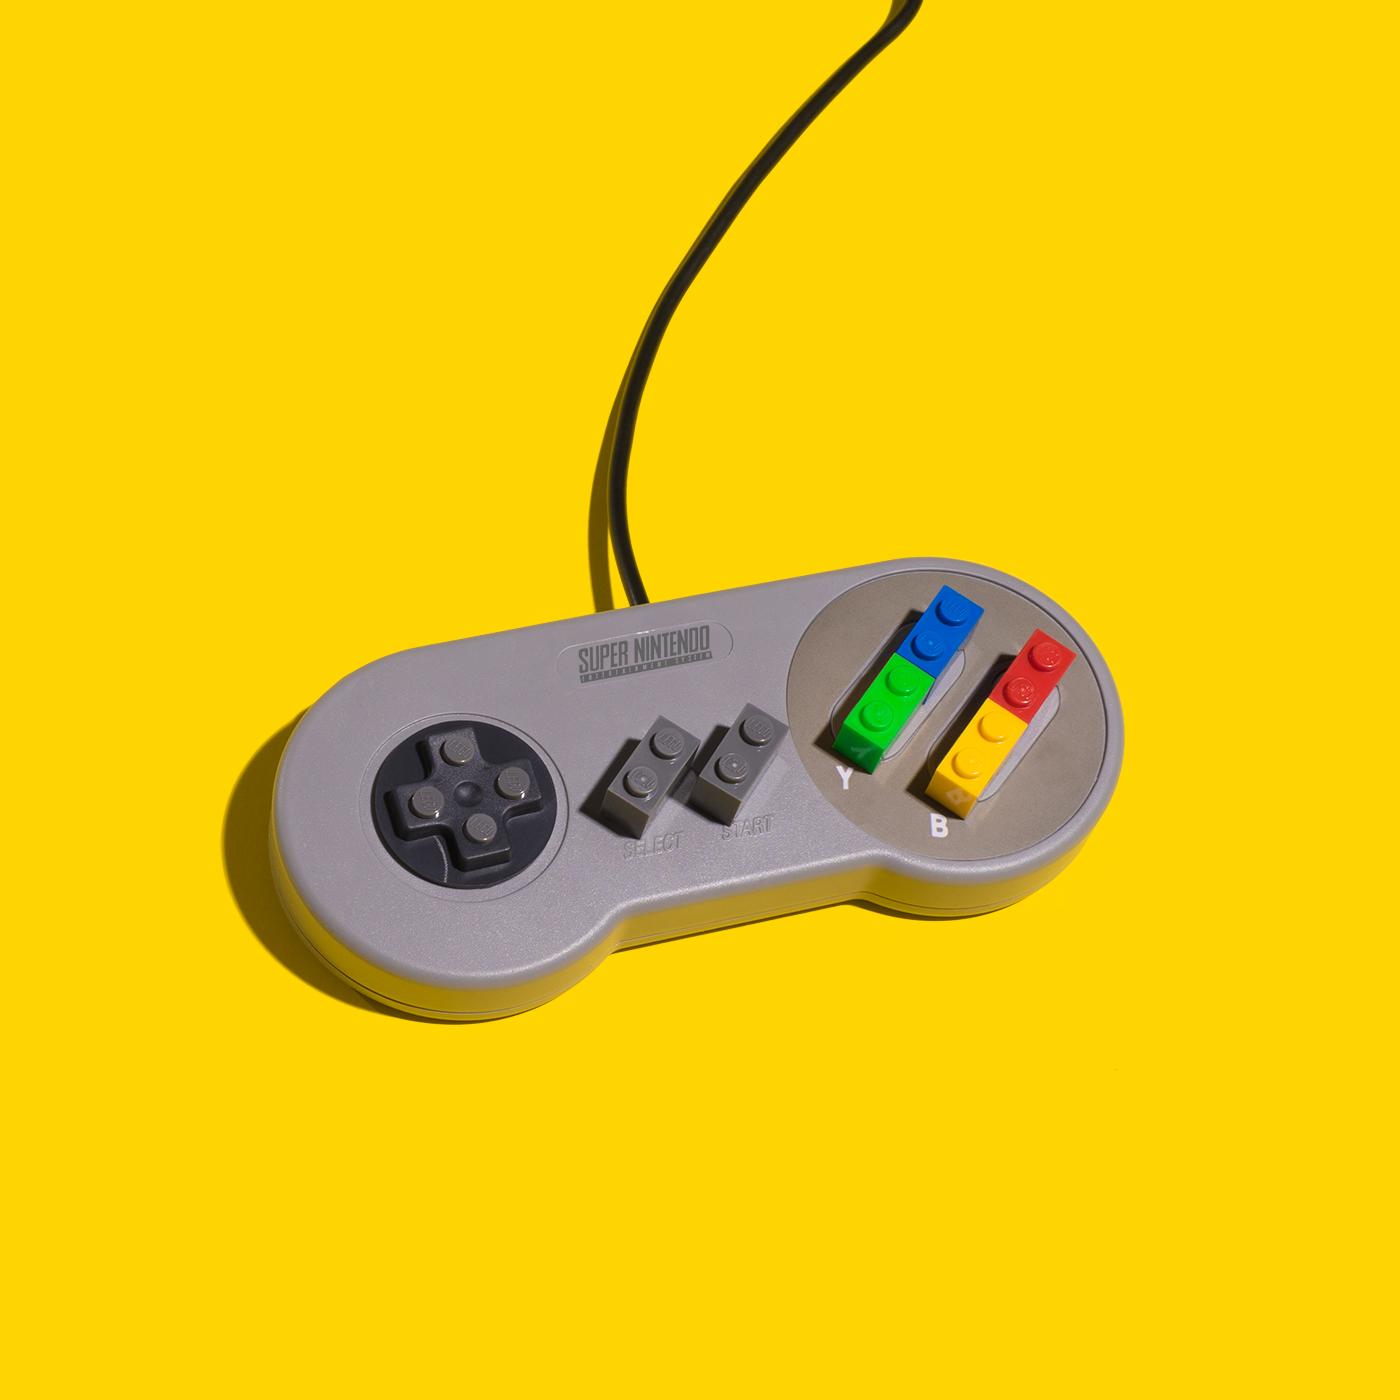 art minimal colorful studio digital editorial LEGO tetris Nintendo inspire